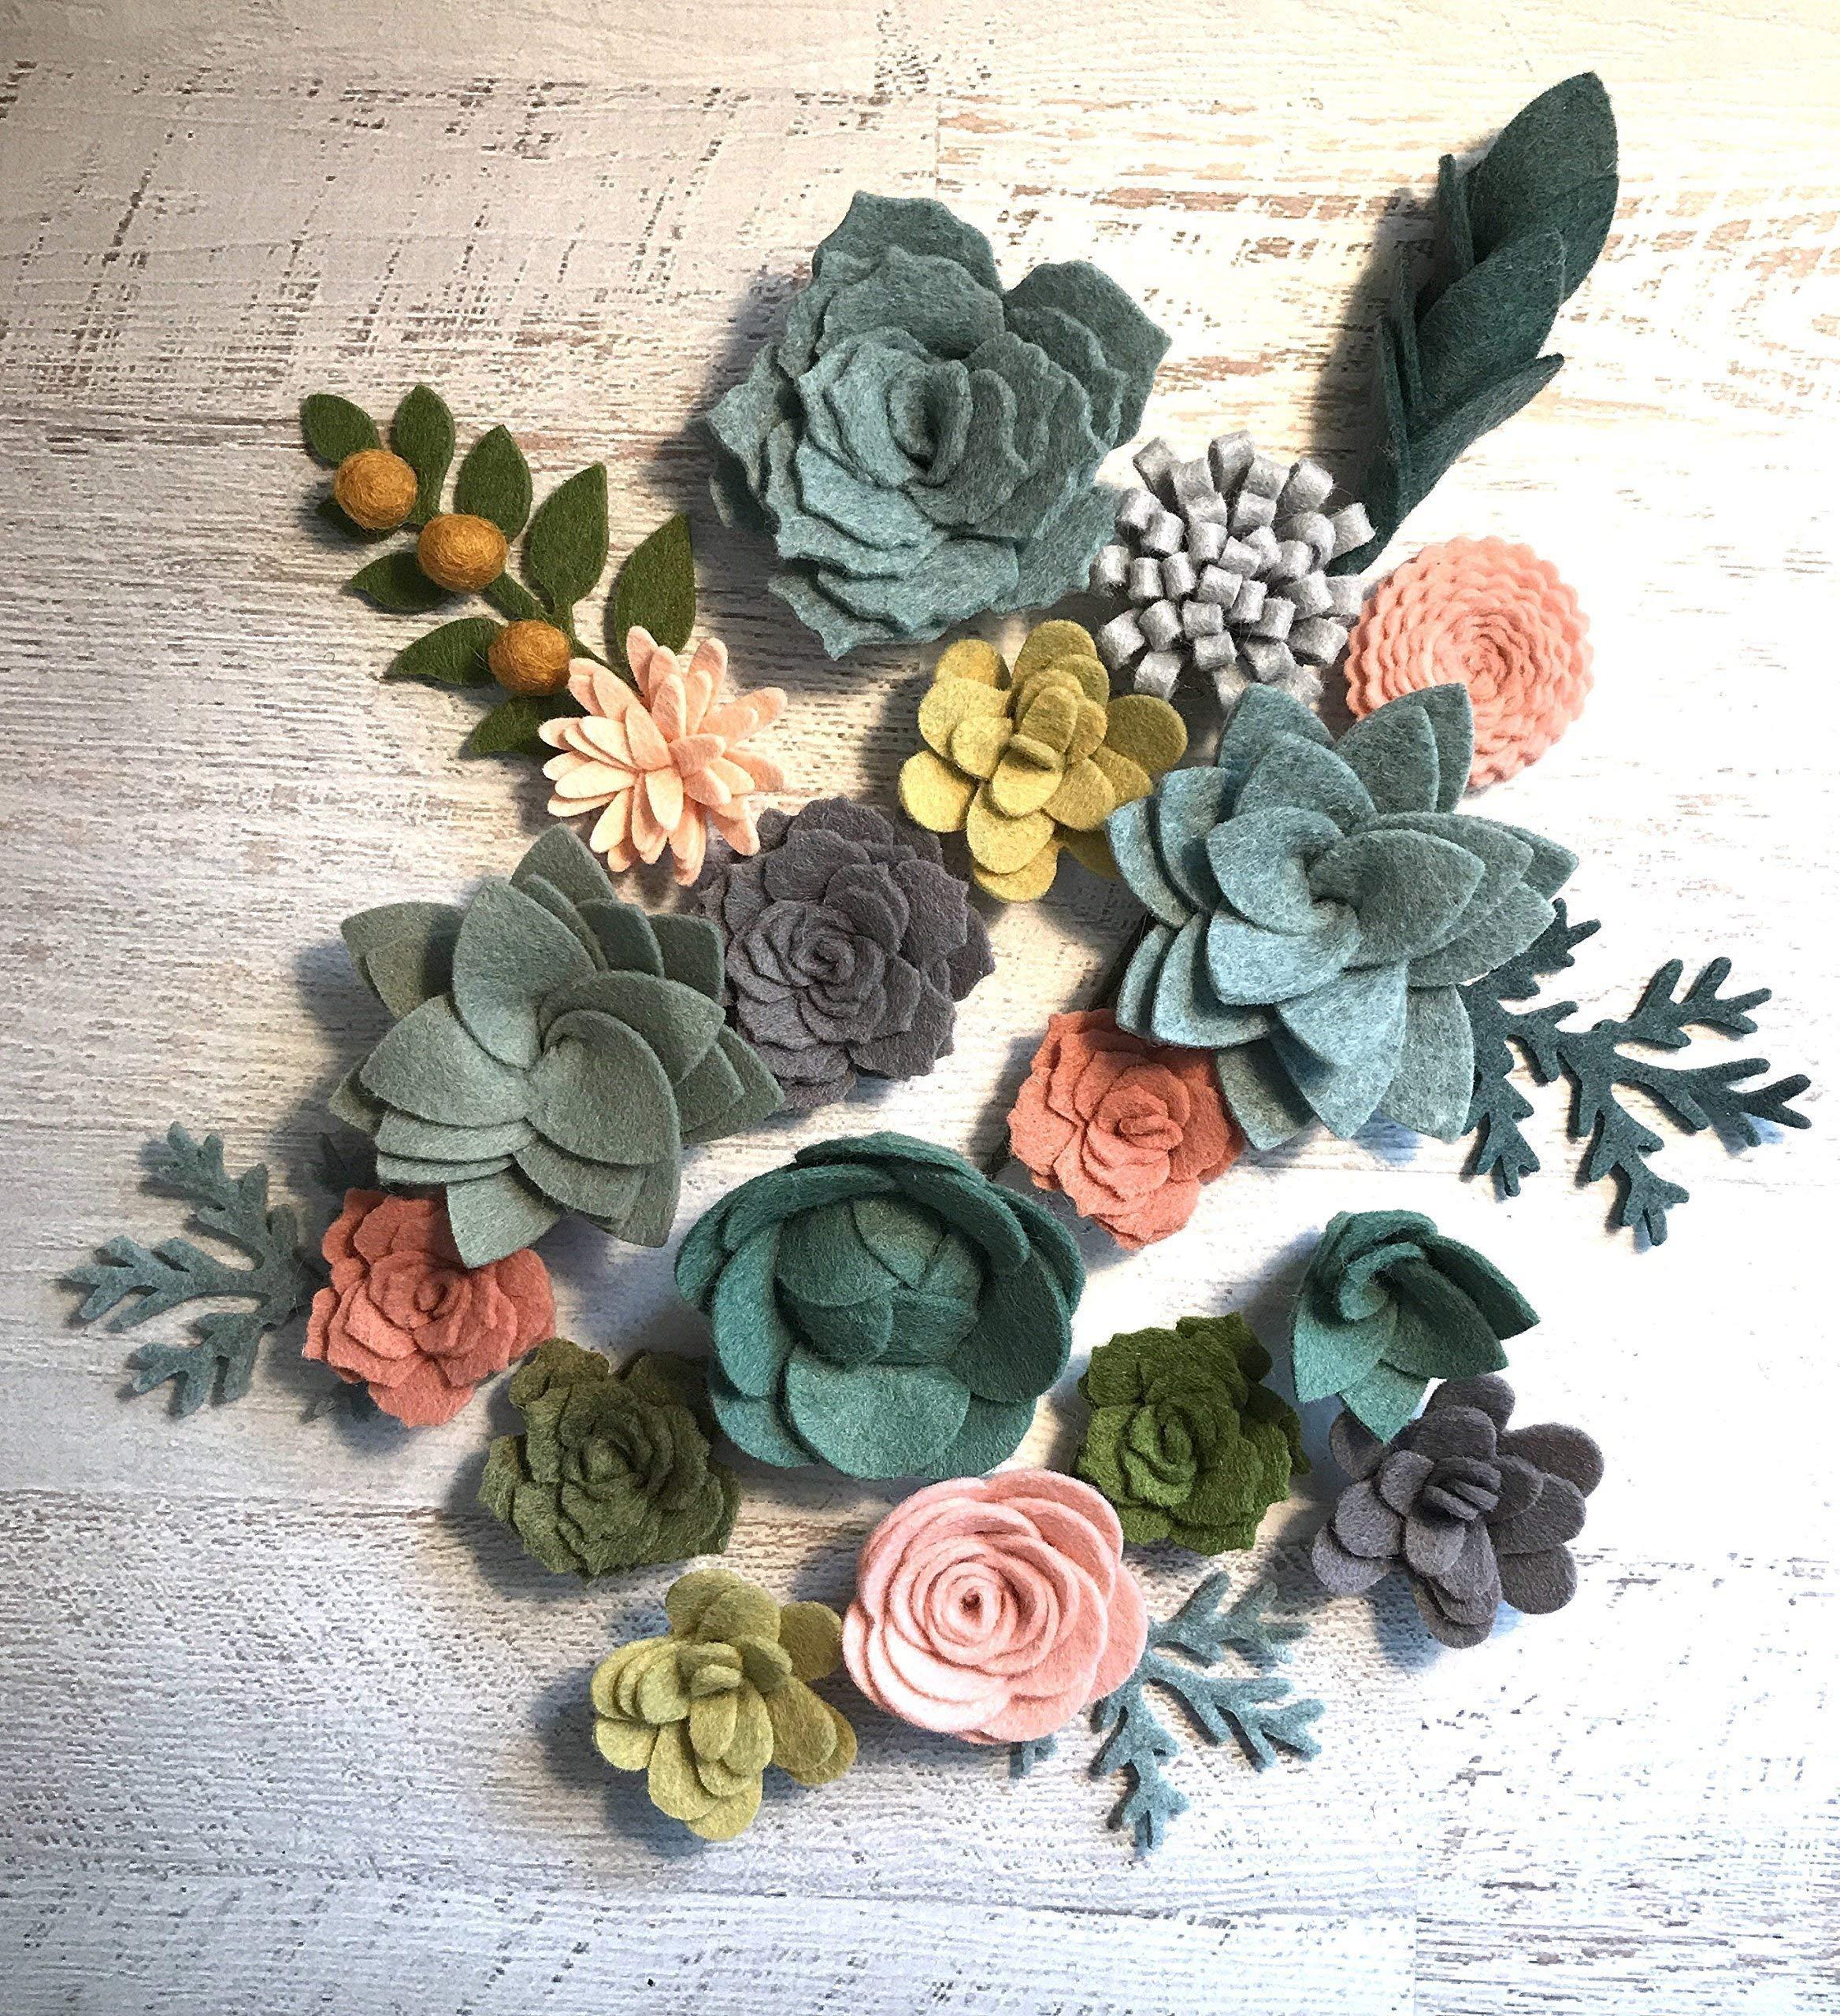 silk flower arrangements wool felt succulents and flowers - 18 flowers & 4 leaves - create headbands, diy wreaths, garlands, vertical gardens